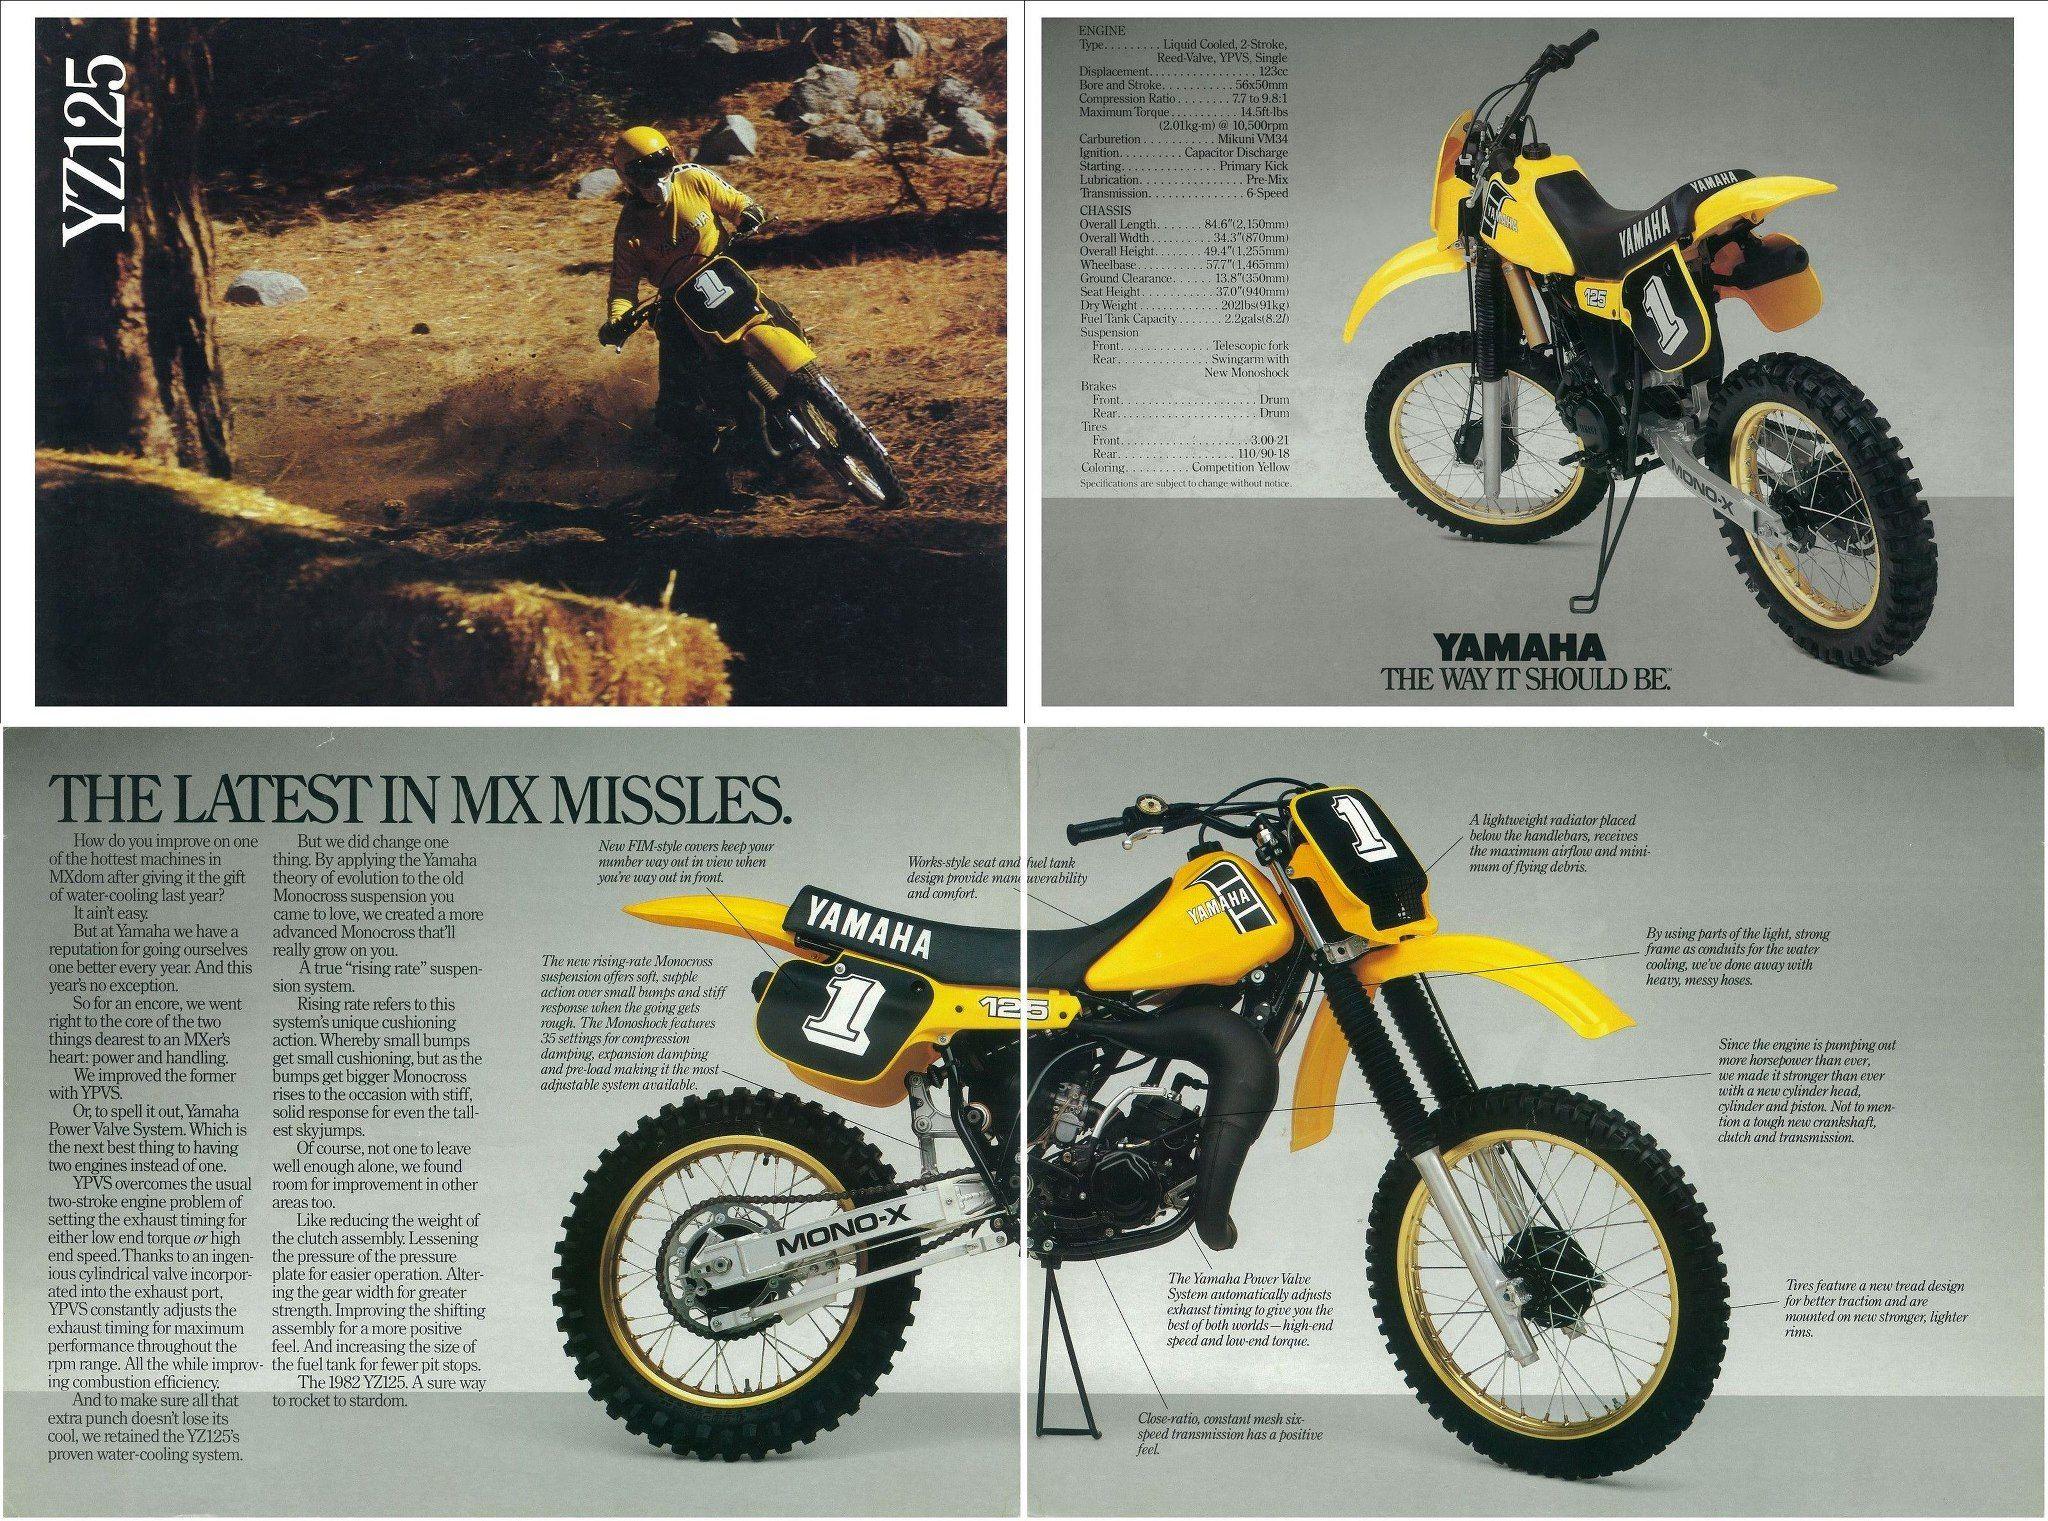 1982 Yamaha Yz125 I Had The 1982 Yz100 When I Was Younger Great Bike Vintage Motocross Yamaha Bikes Dirtbikes